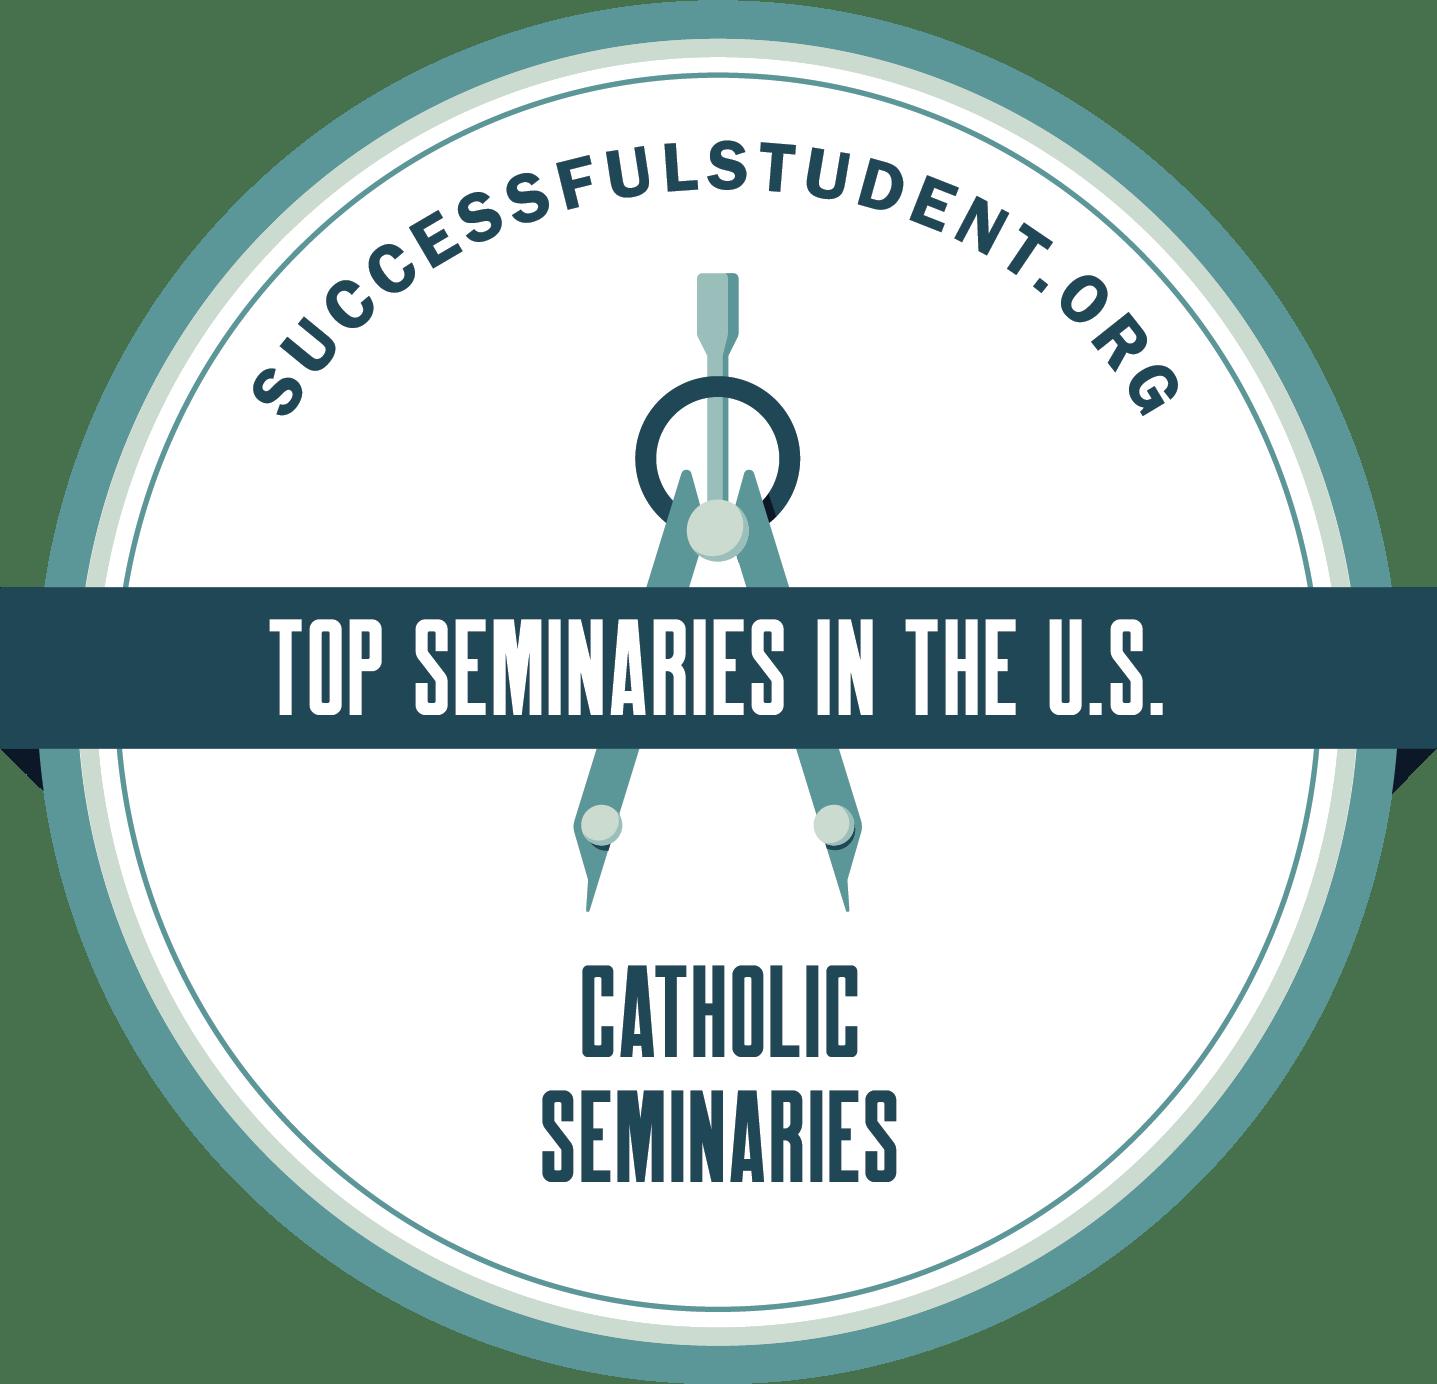 Top 10 Catholic and Eastern Orthodox Seminaries's Badge